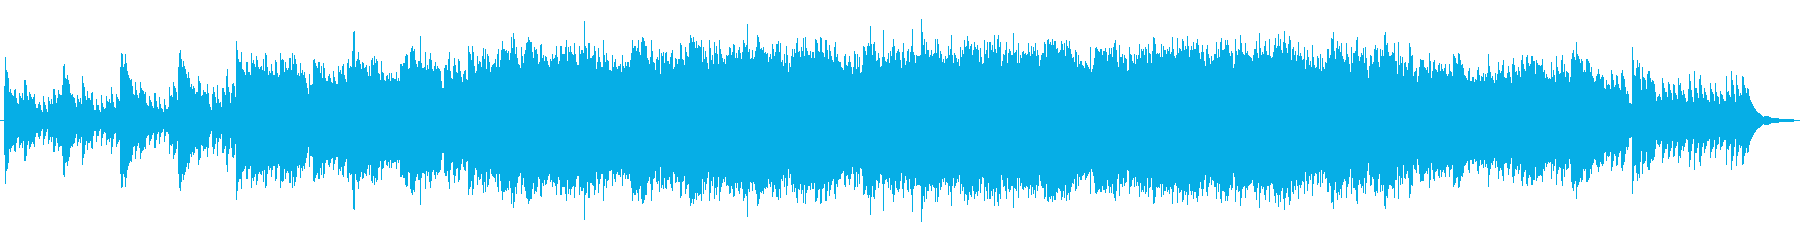 01 ENDING PIANO&TVCMの再生済みの波形